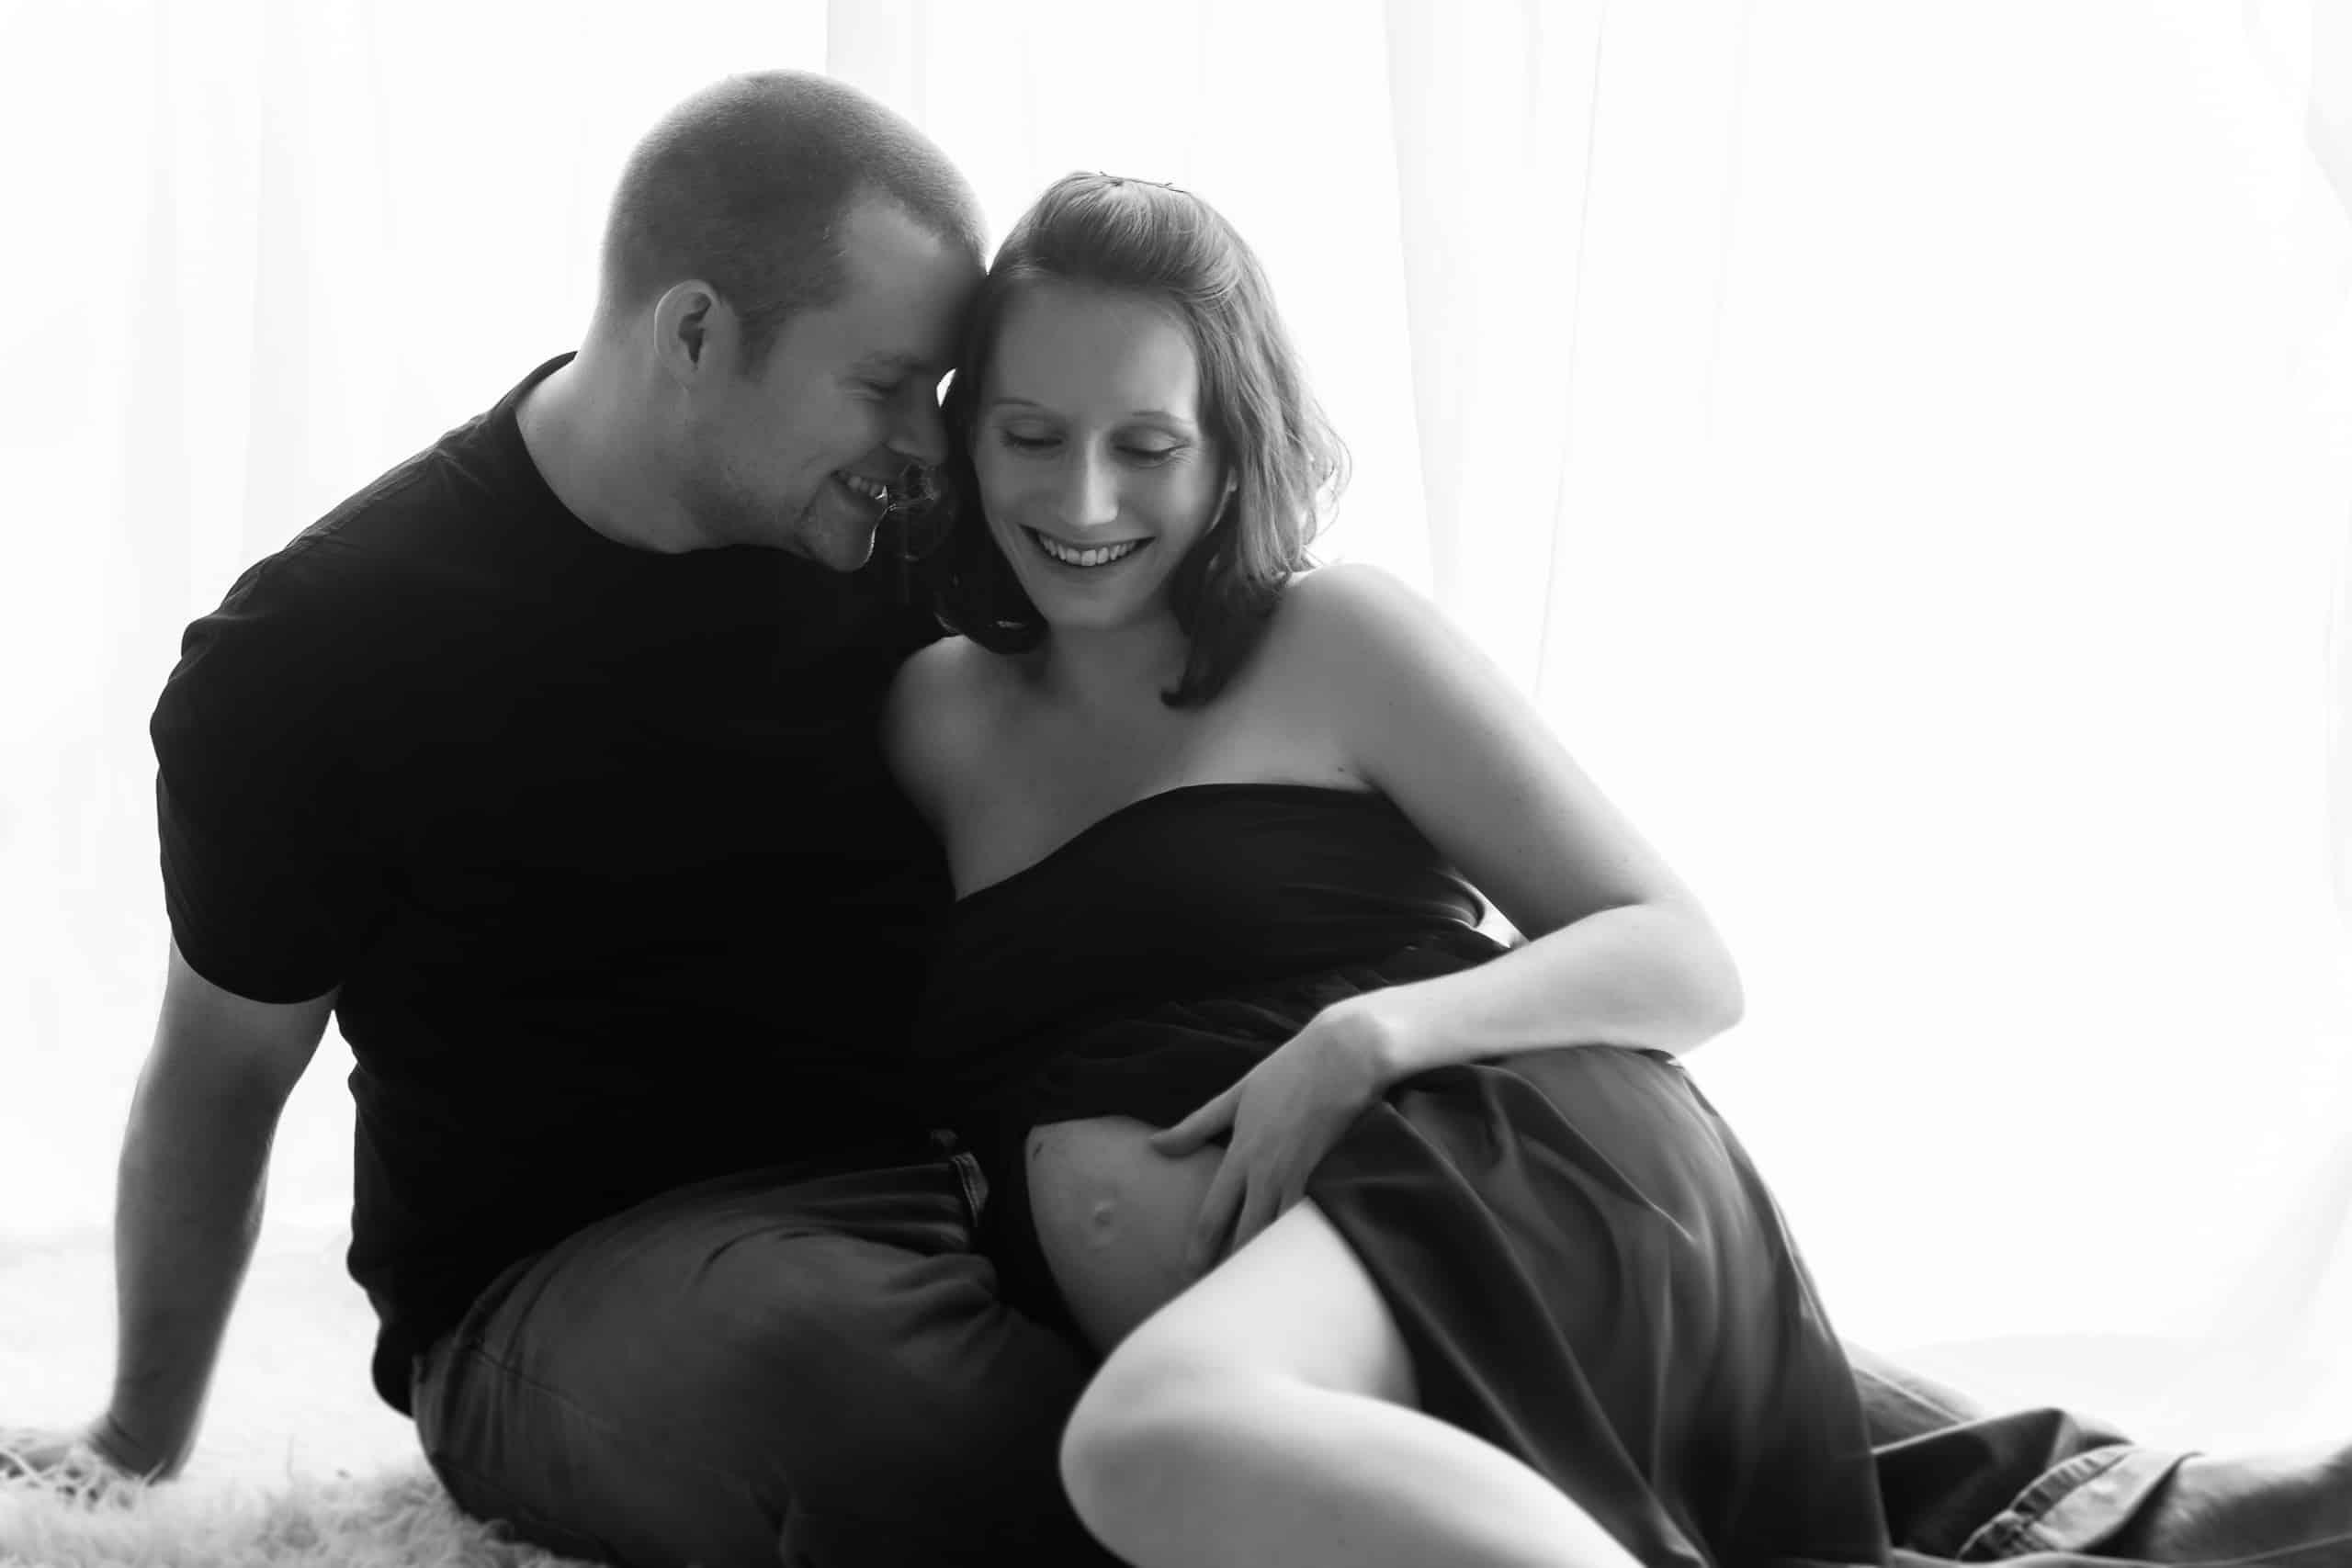 Maternity mini photo shoot explained. 9